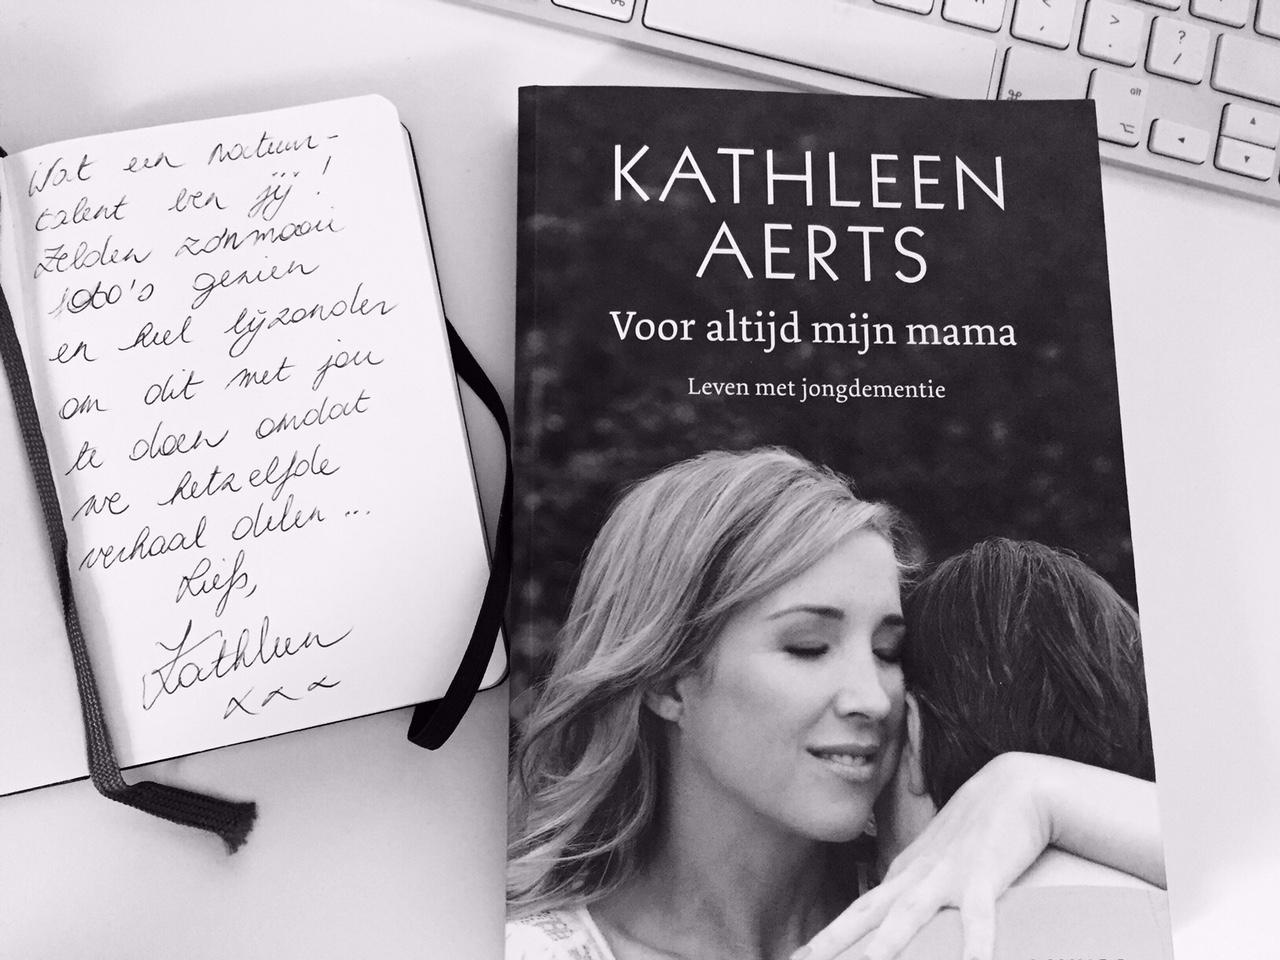 Kathleen Aerts | Alzheimer special